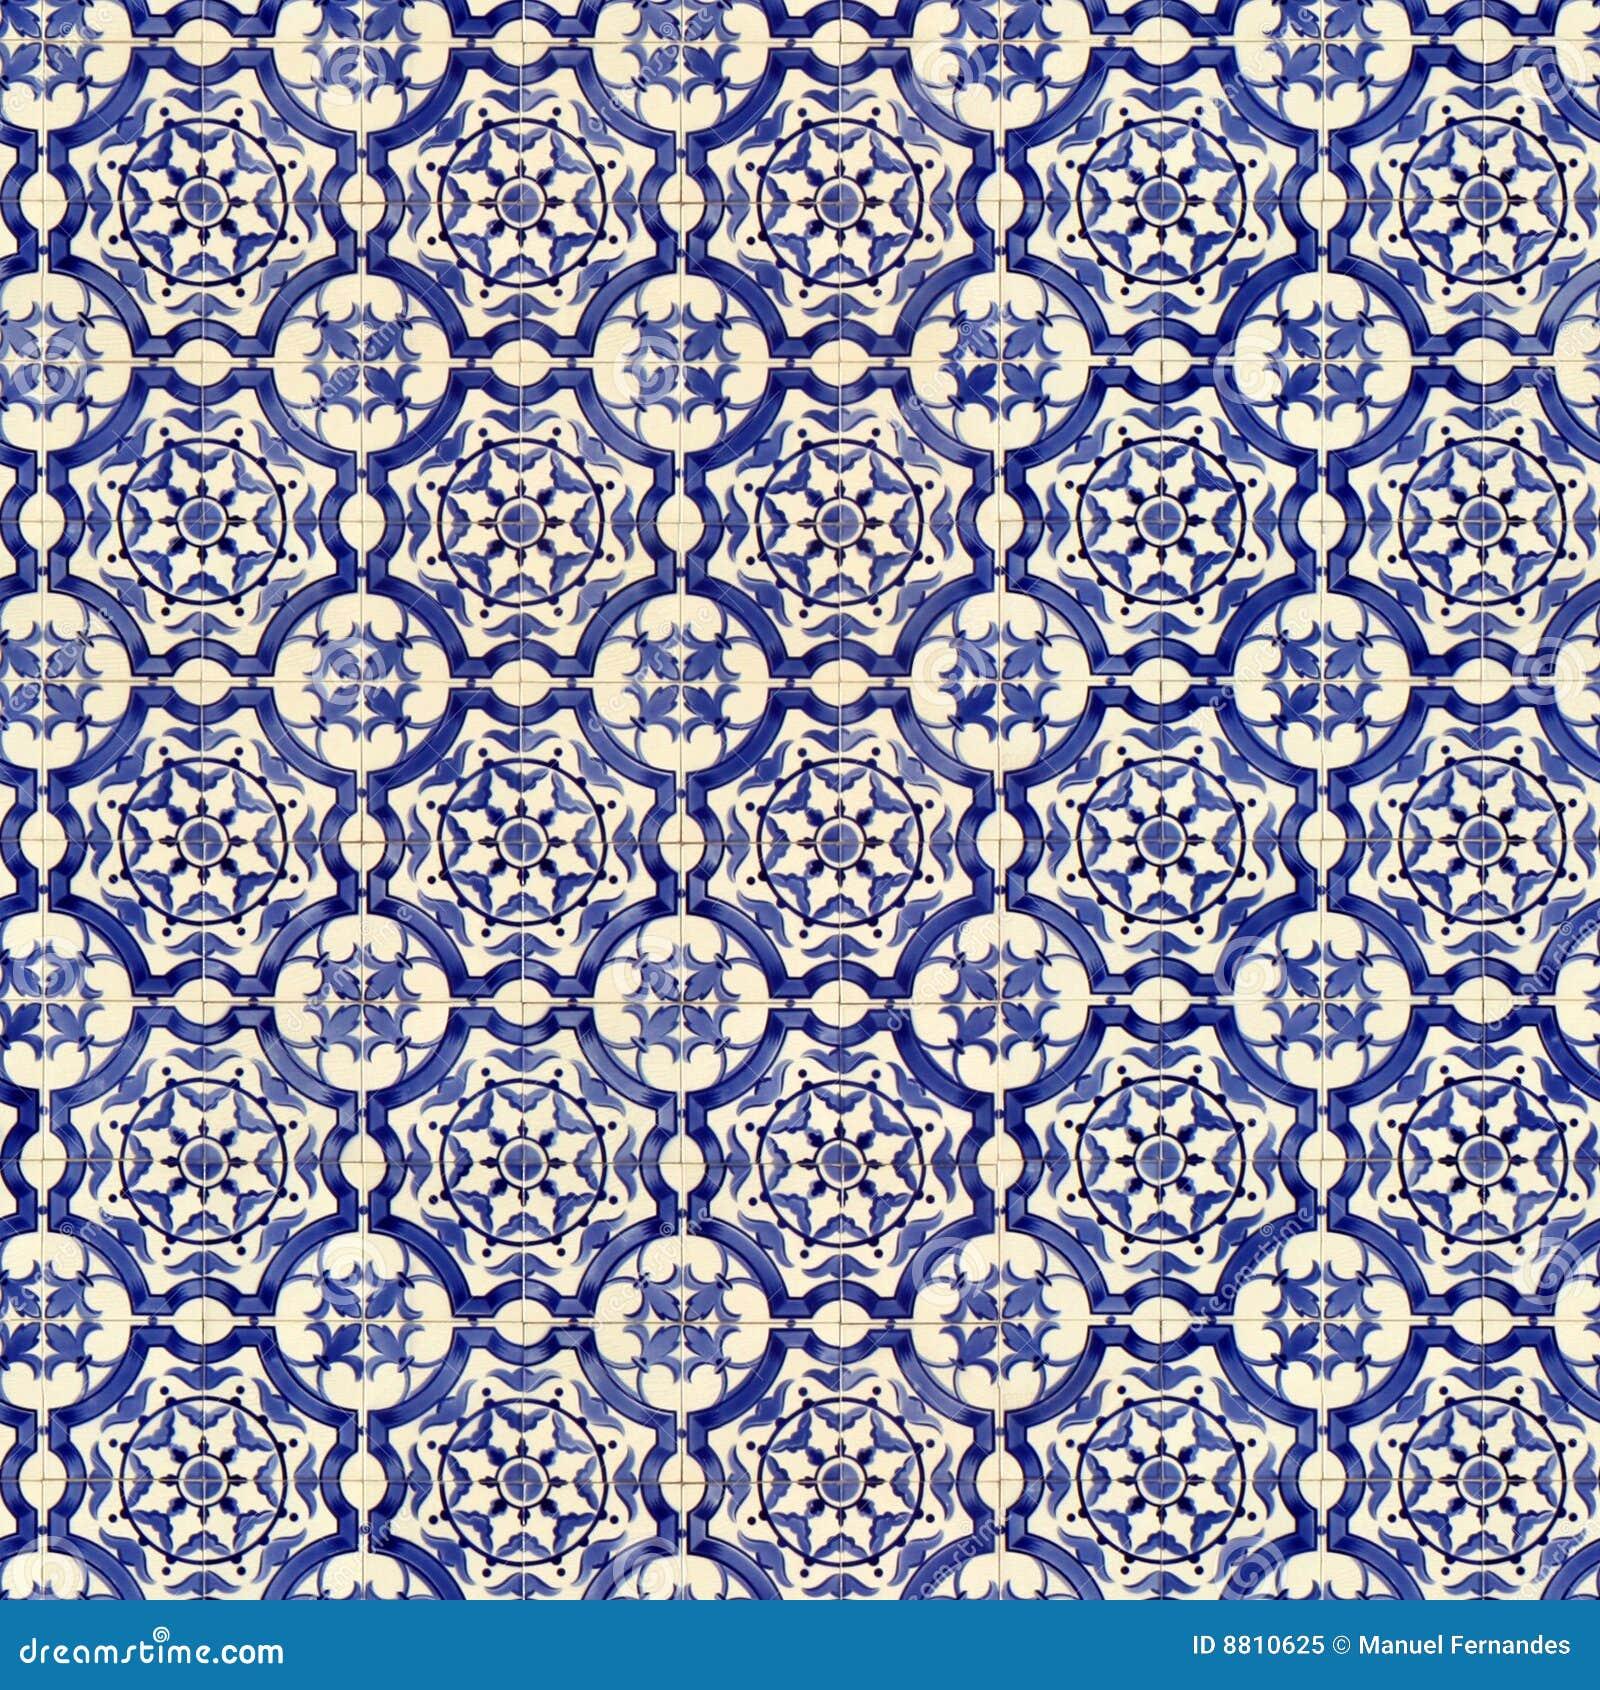 Seamless Tile Pattern Of Ancient Ceramic Tiles Stock Image - Image ...